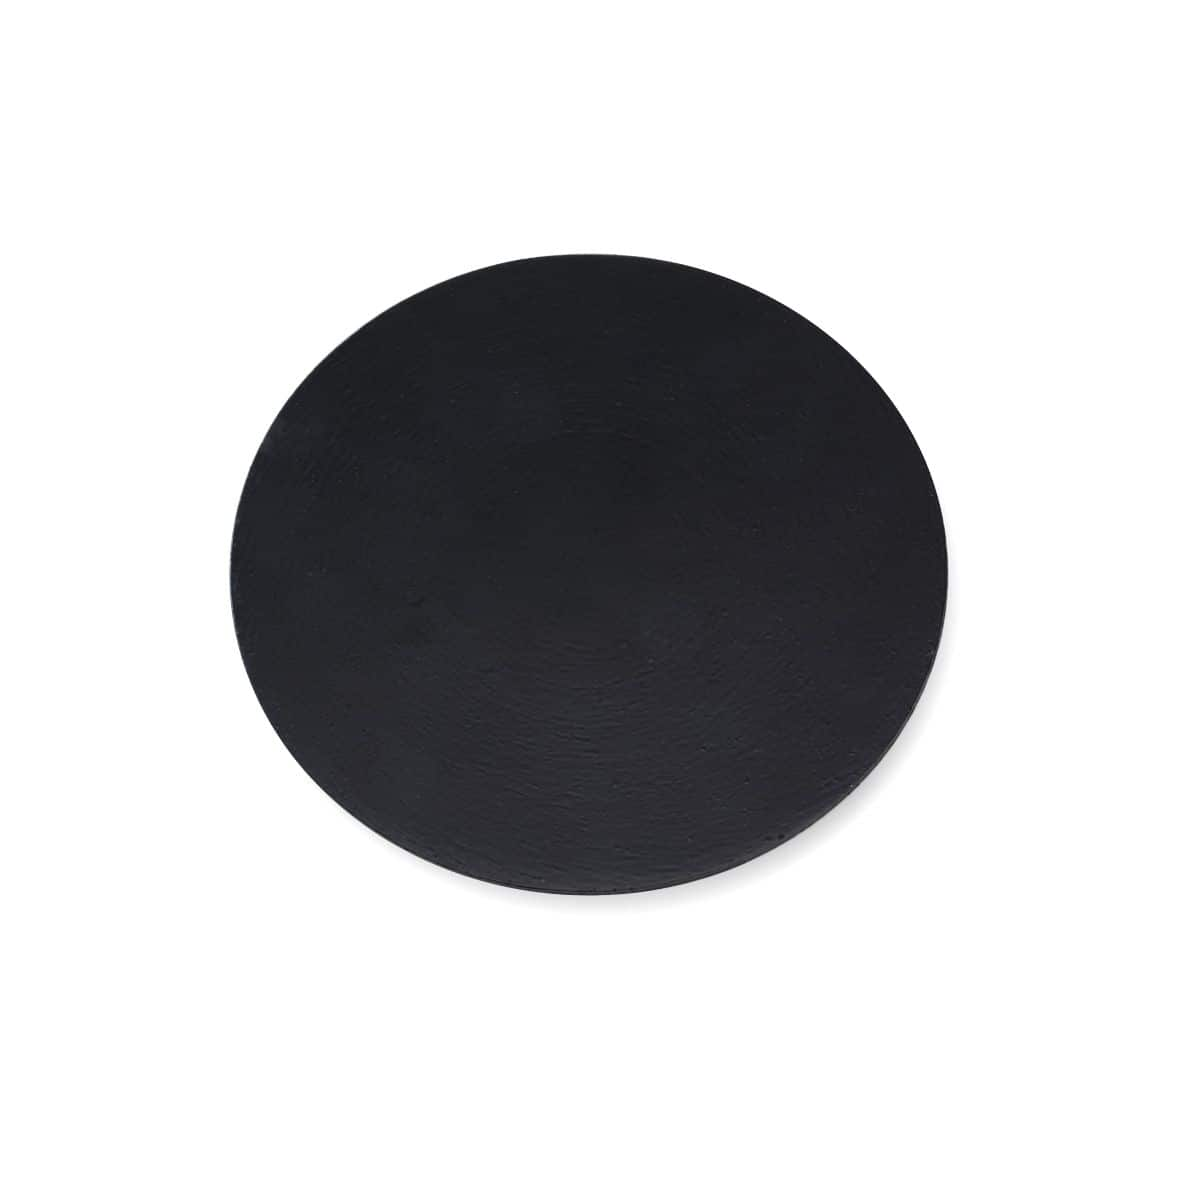 Kerzenteller Alu 100 mm, schwarz